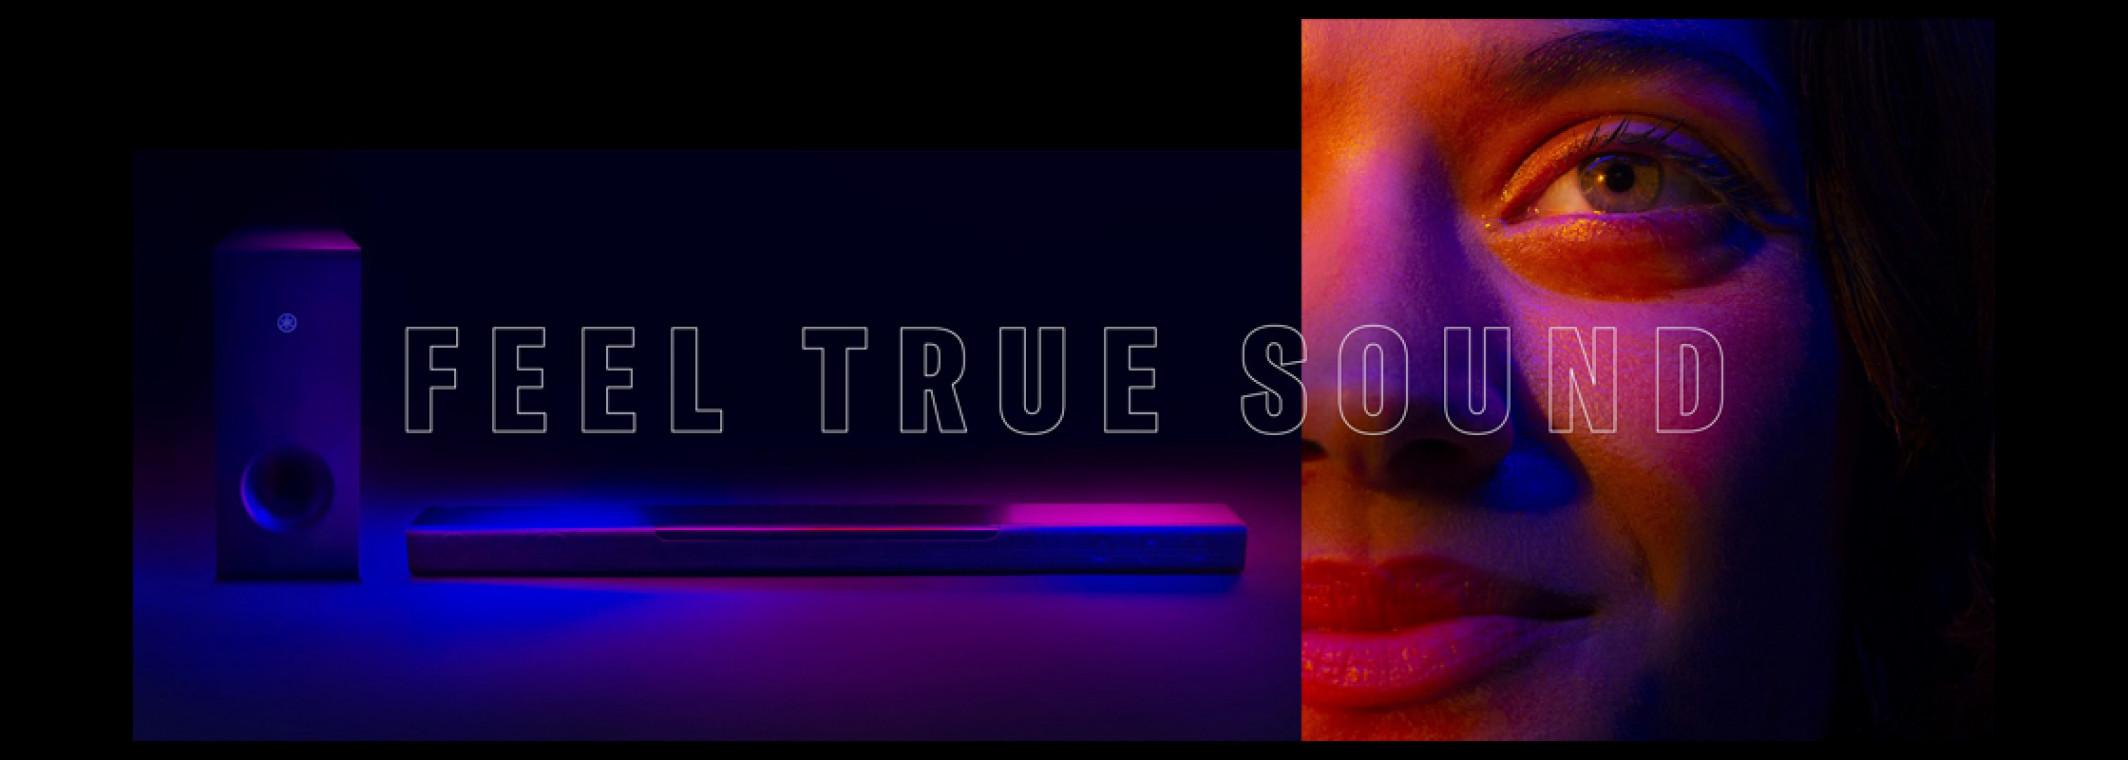 feel_true_sound.jpg